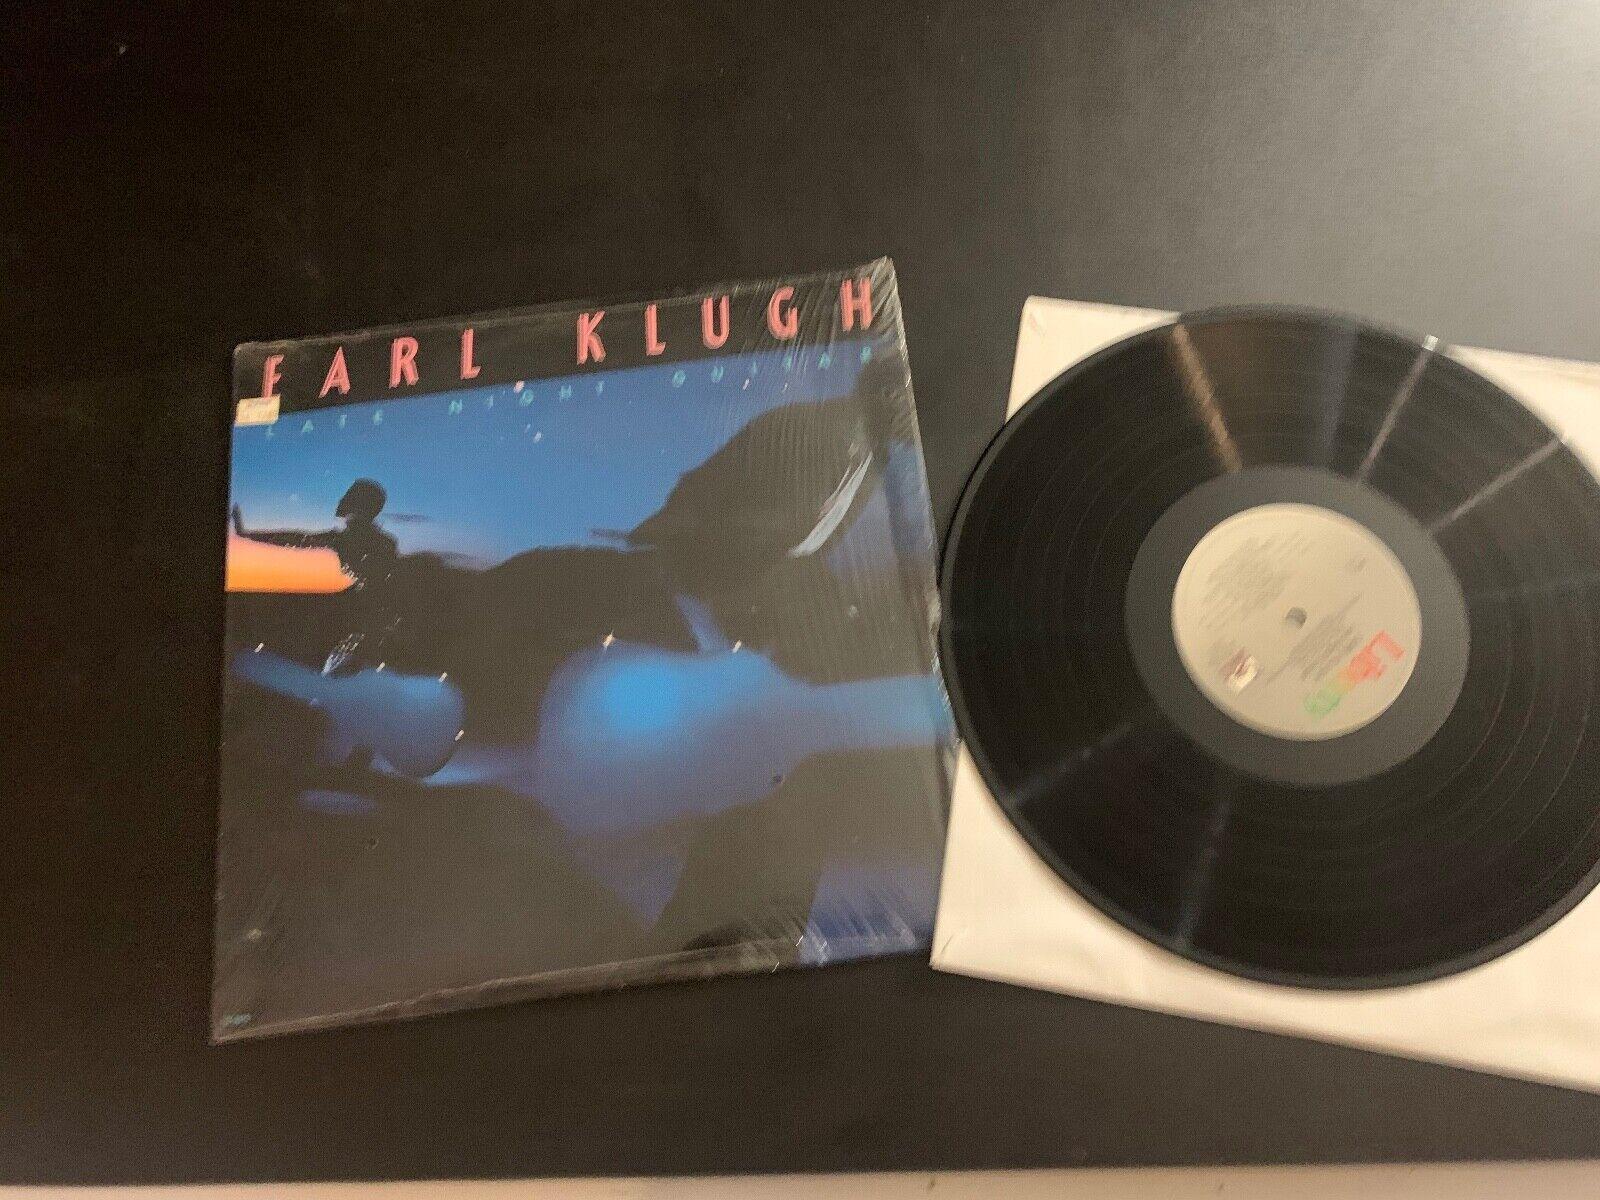 LP RECORD - EARL KLUGH - LATE NIGHT GUITAR - LIBERTY RECORDS - $9.99